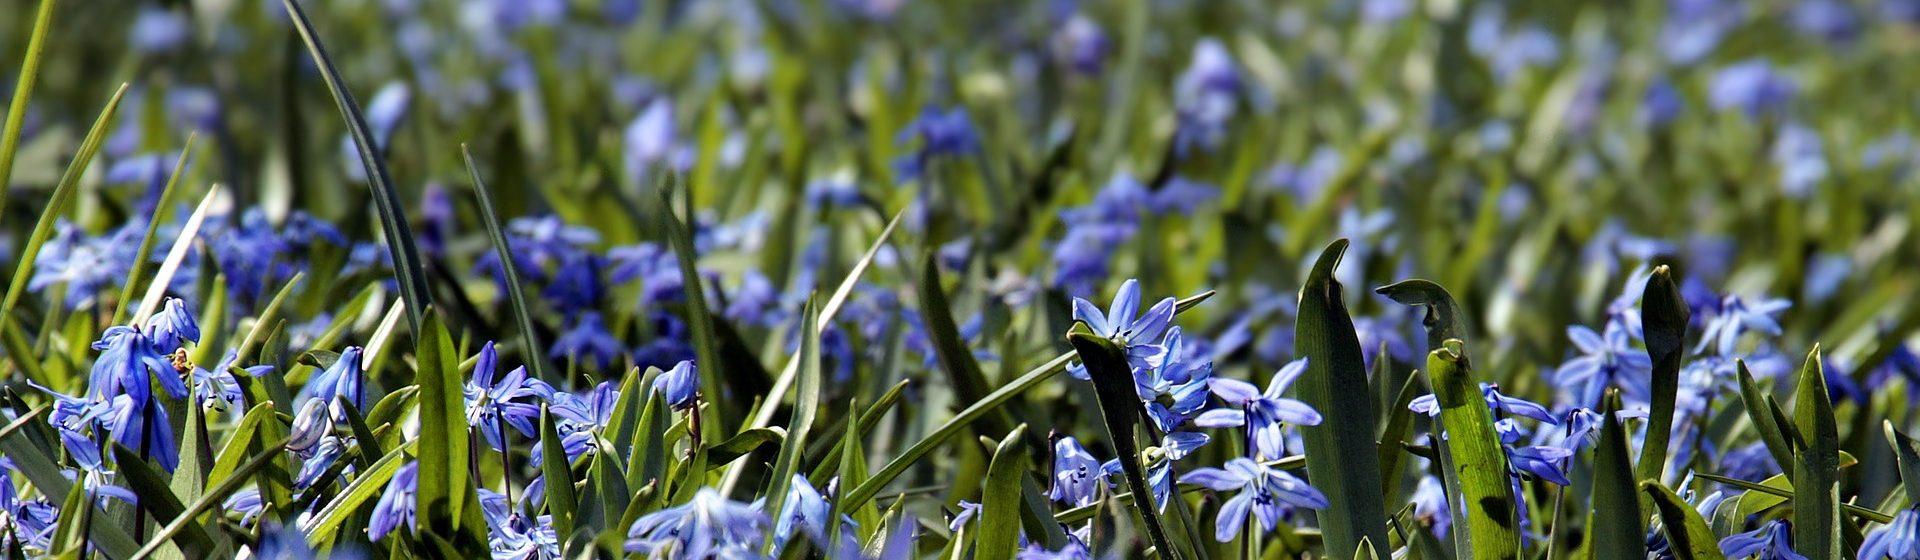 hedrickorchids.com